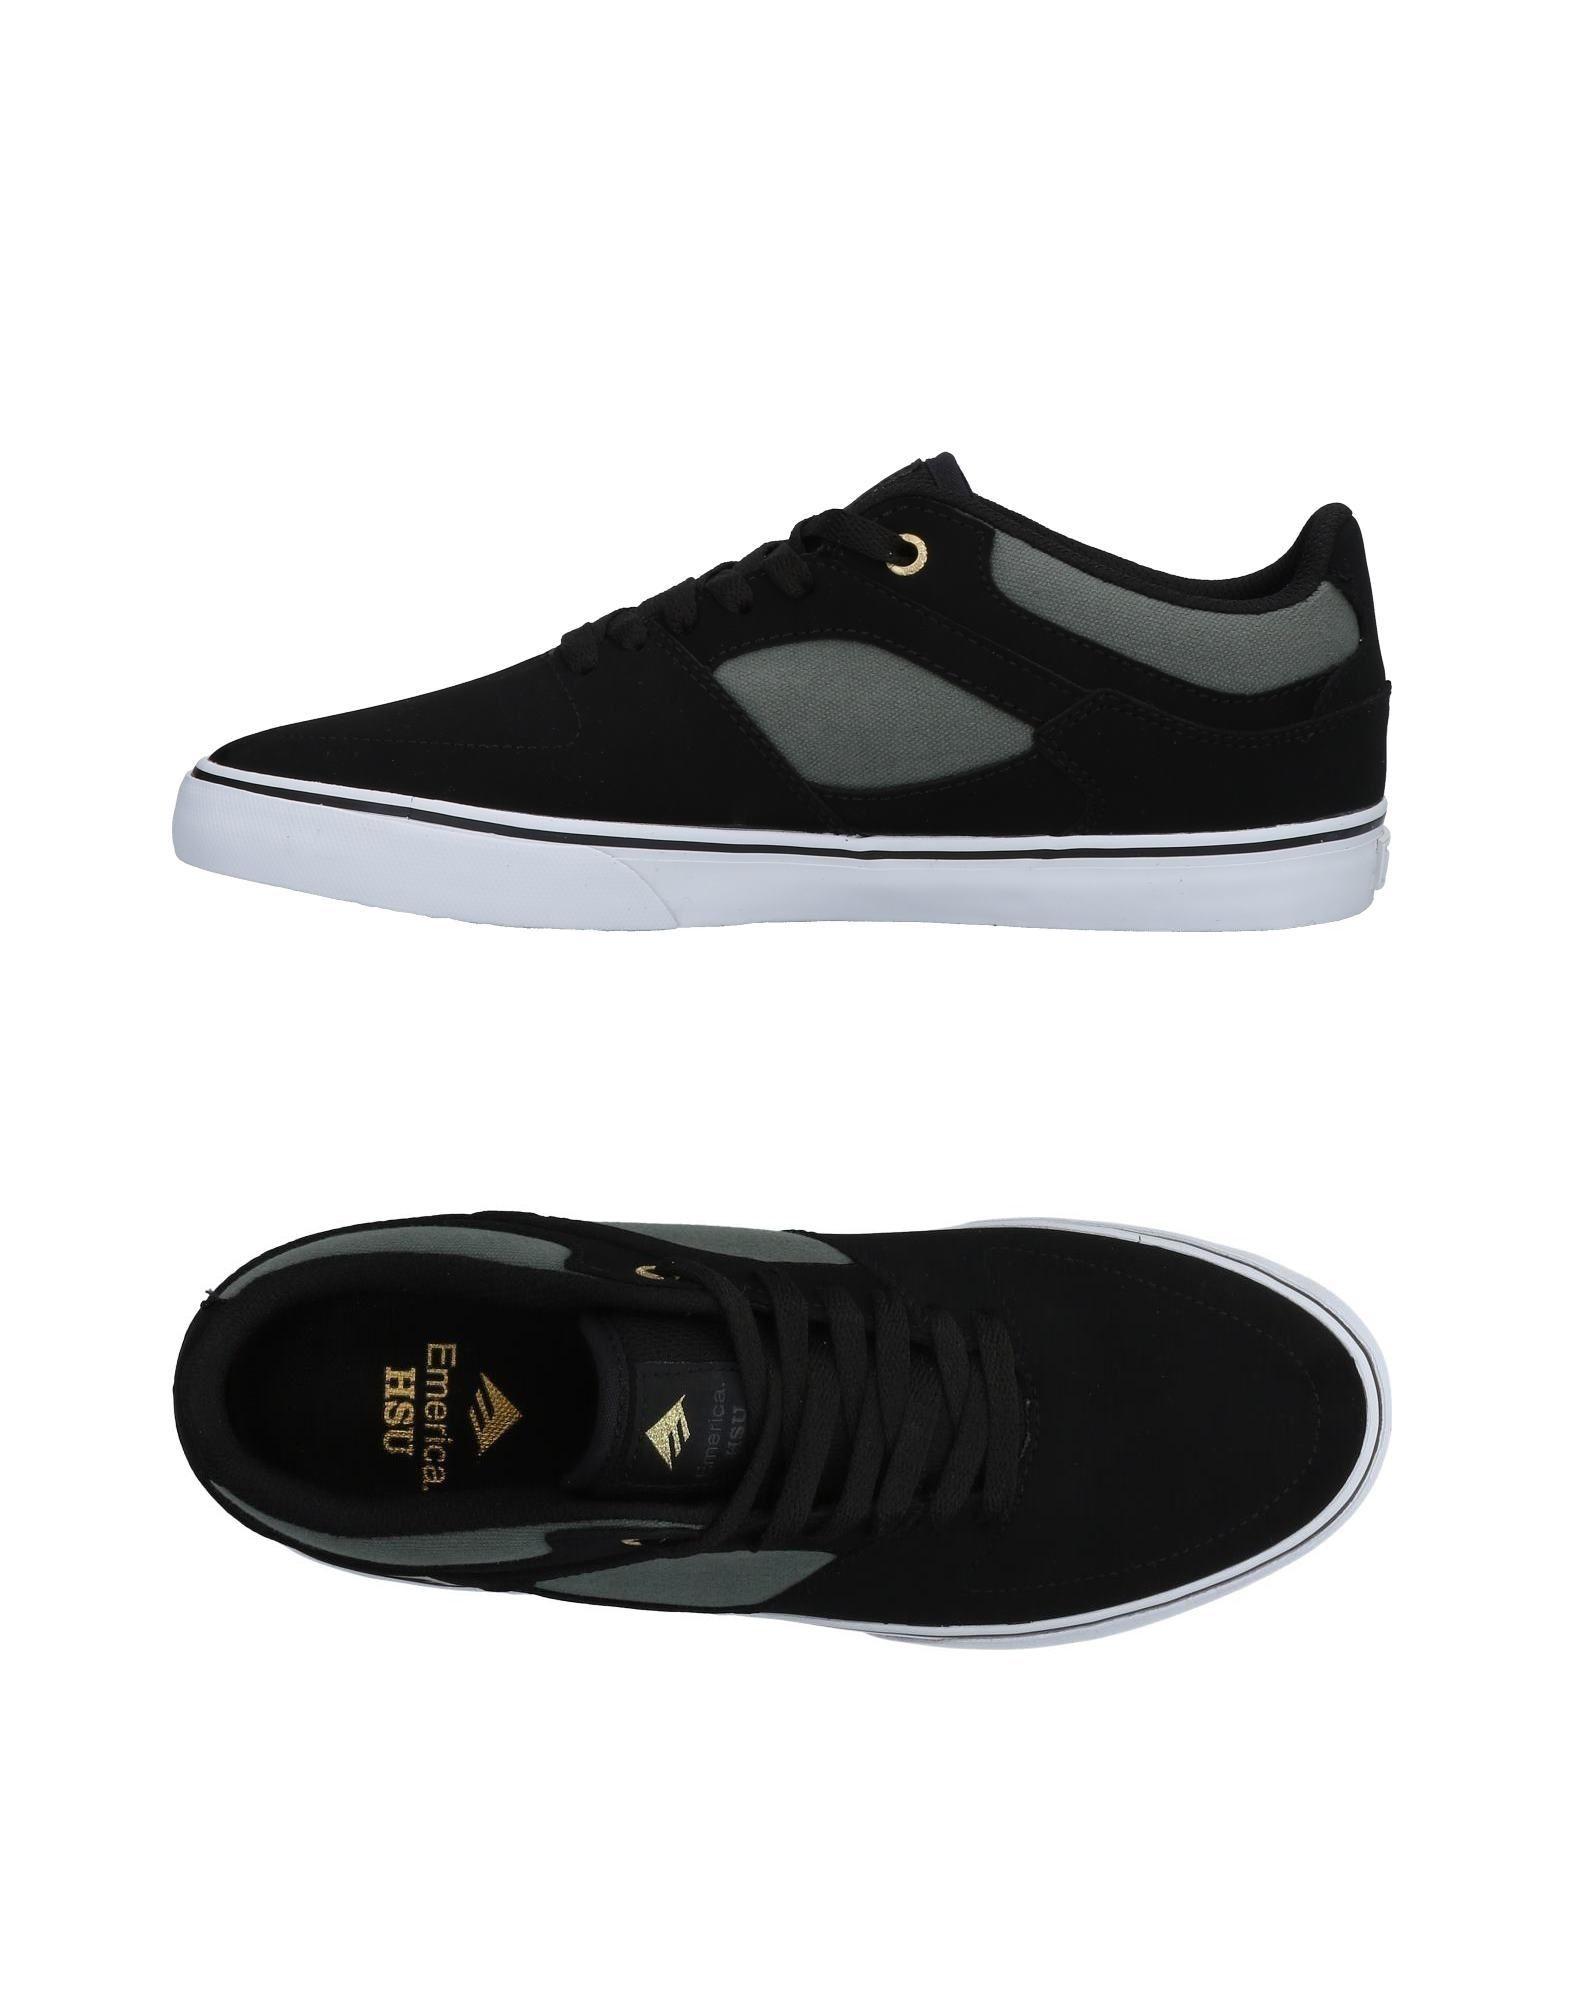 EMERICA Herren Low Sneakers & Tennisschuhe Farbe Schwarz Größe 5